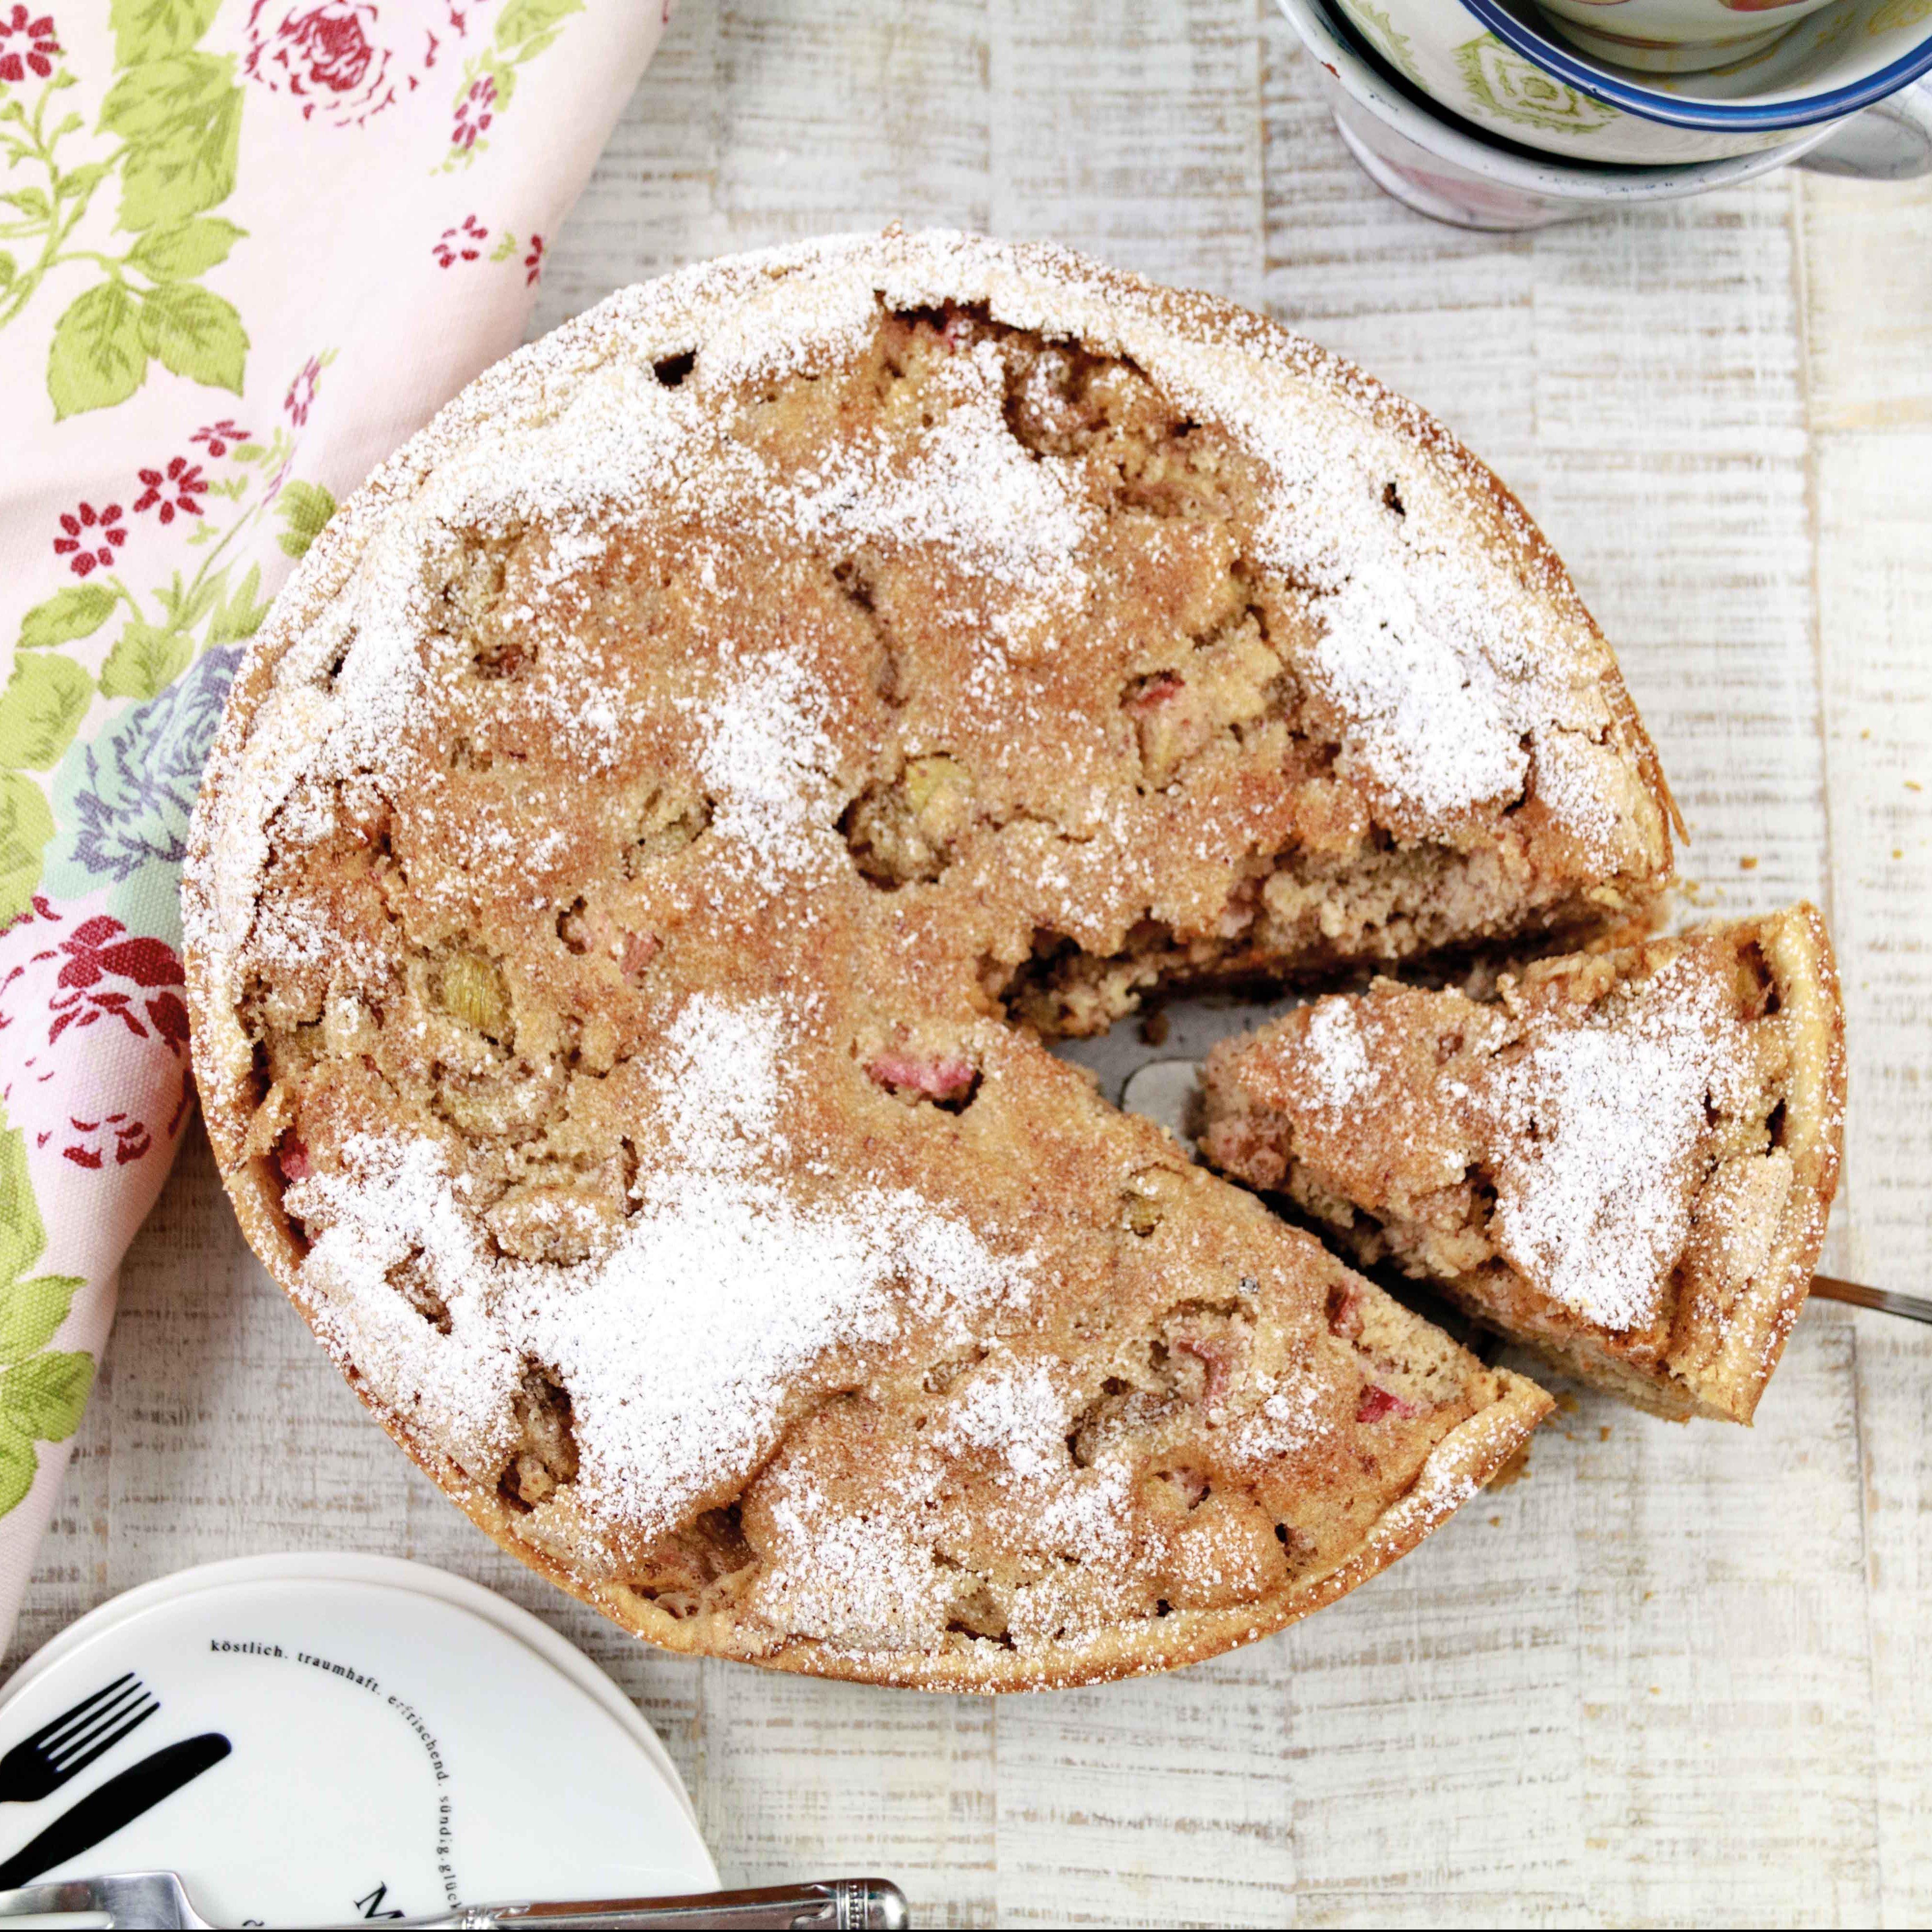 Rhabarber-Baiser-Kuchen // Rhubarb Meringue Cake by http://babyrockmyday.com/rhabarber-baiser-kuchen/